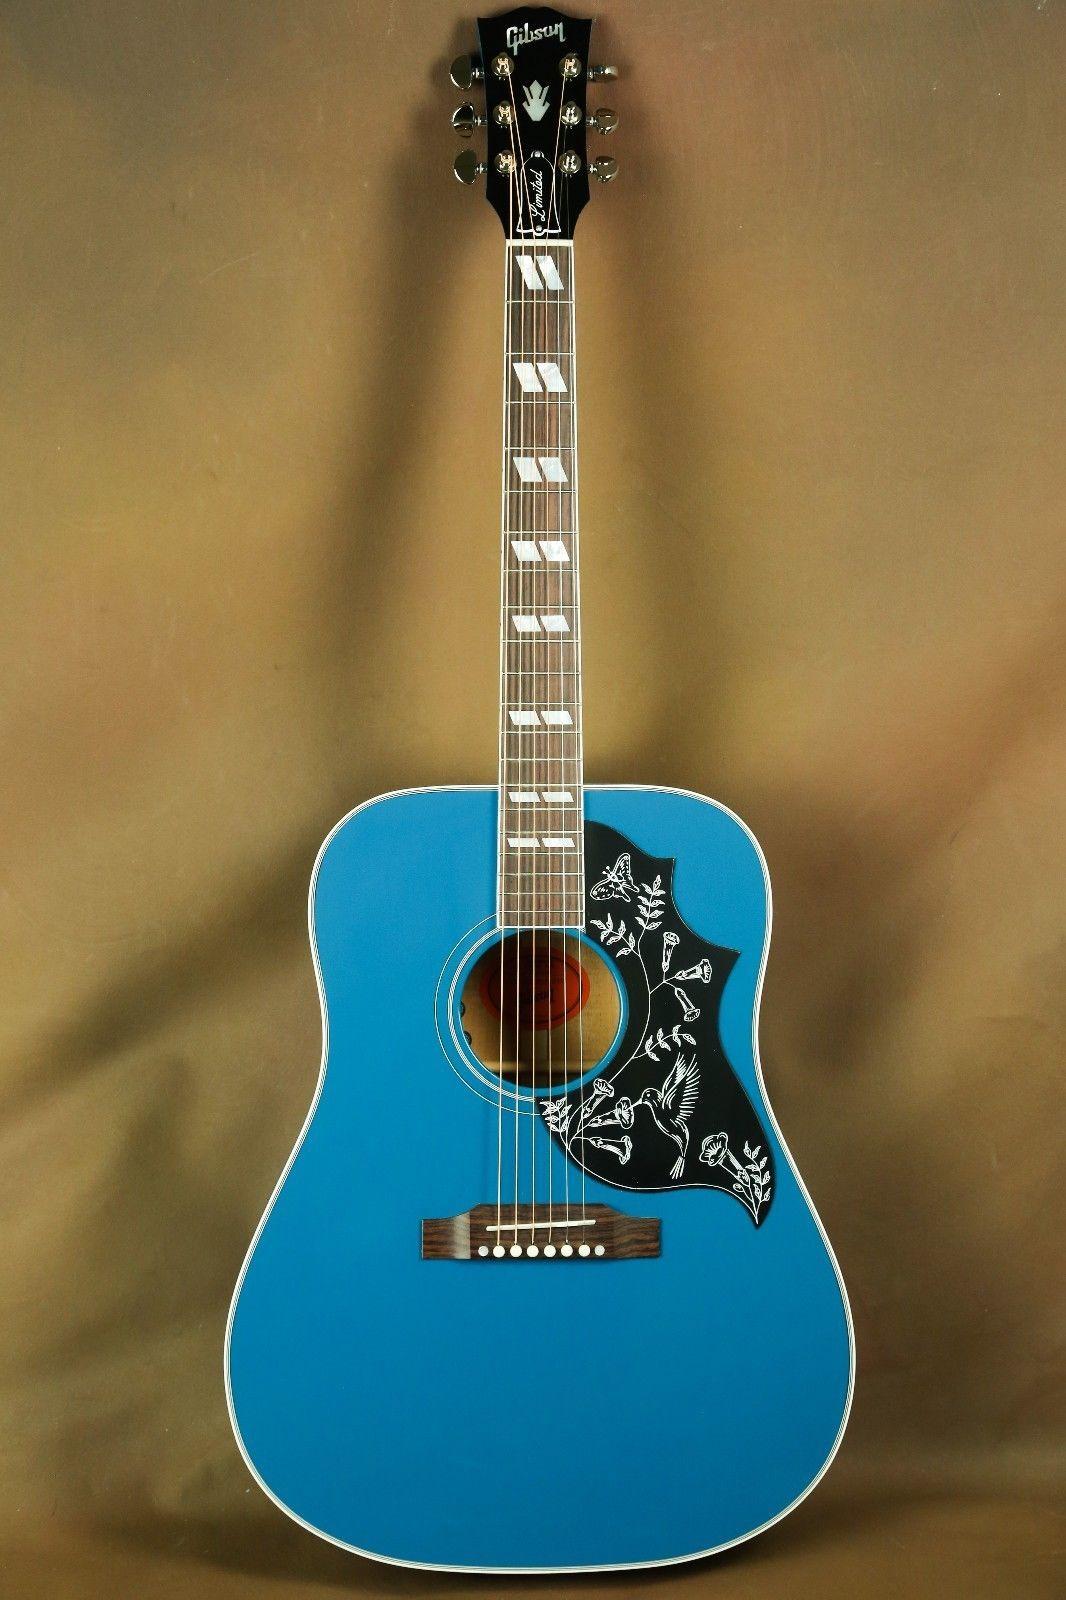 Gibson Hummingbird Custom Blue Finish Acoustic Guitar Guitar Gibson Acoustic Acoustic Guitar